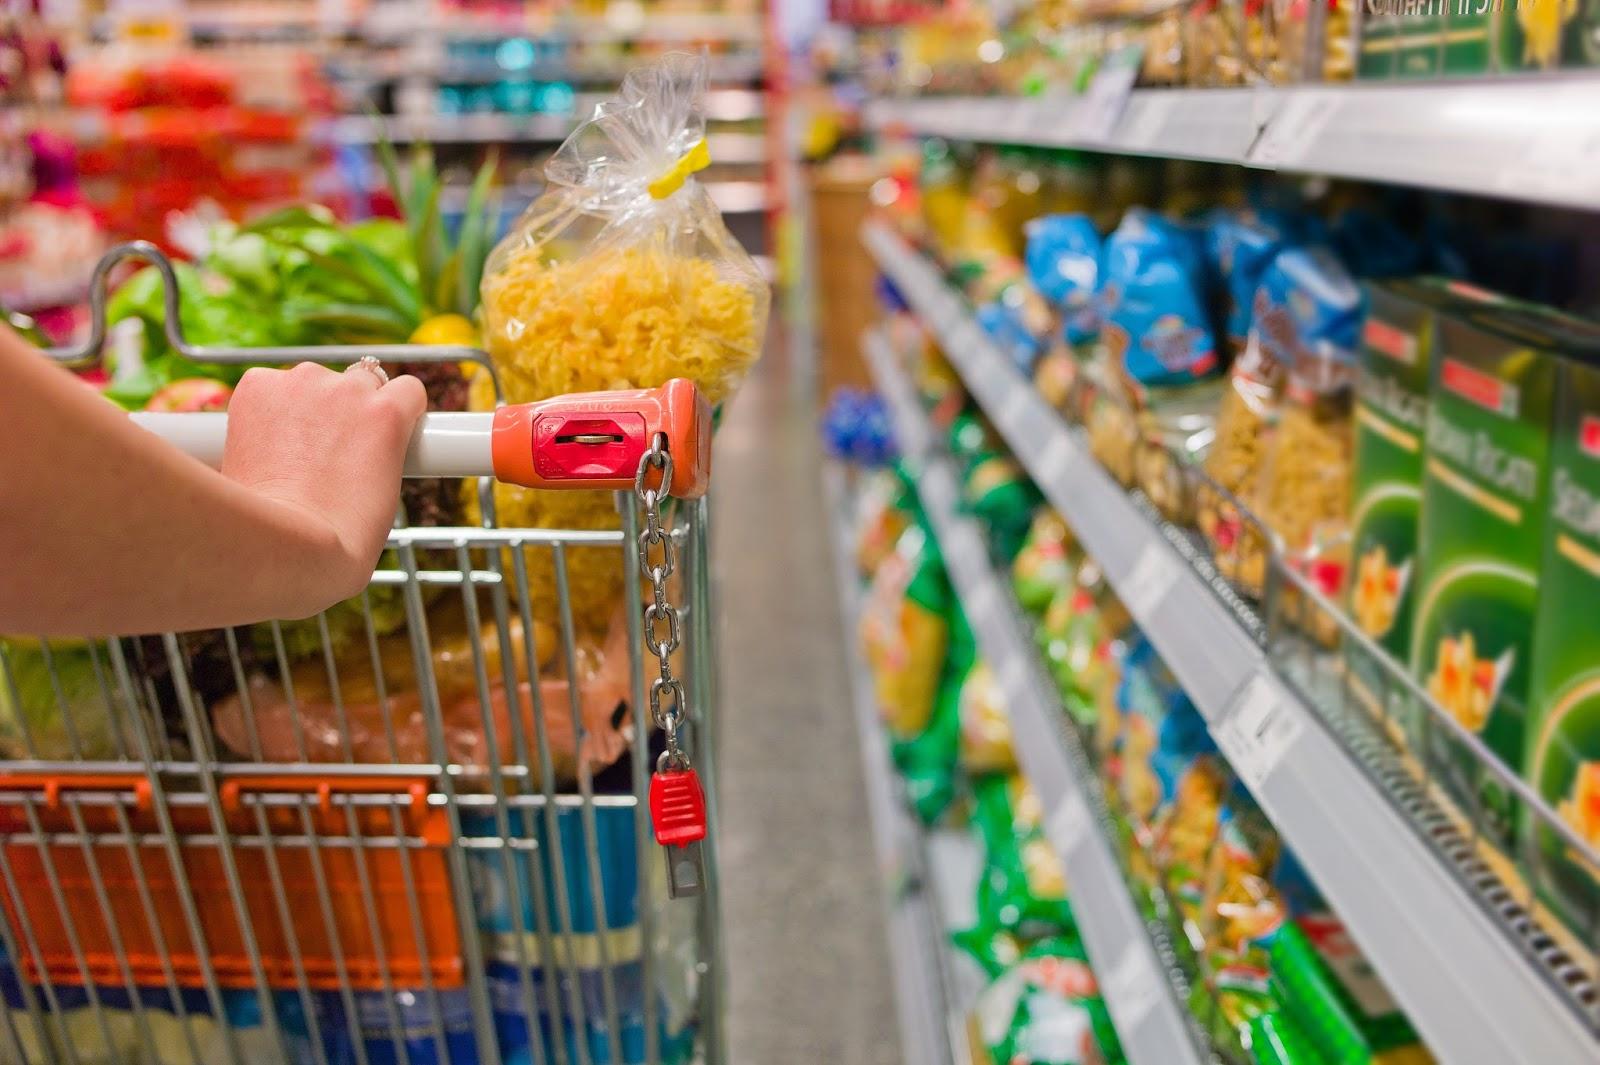 Казахстан на полгода обеспечен продуктами – Тугжанов